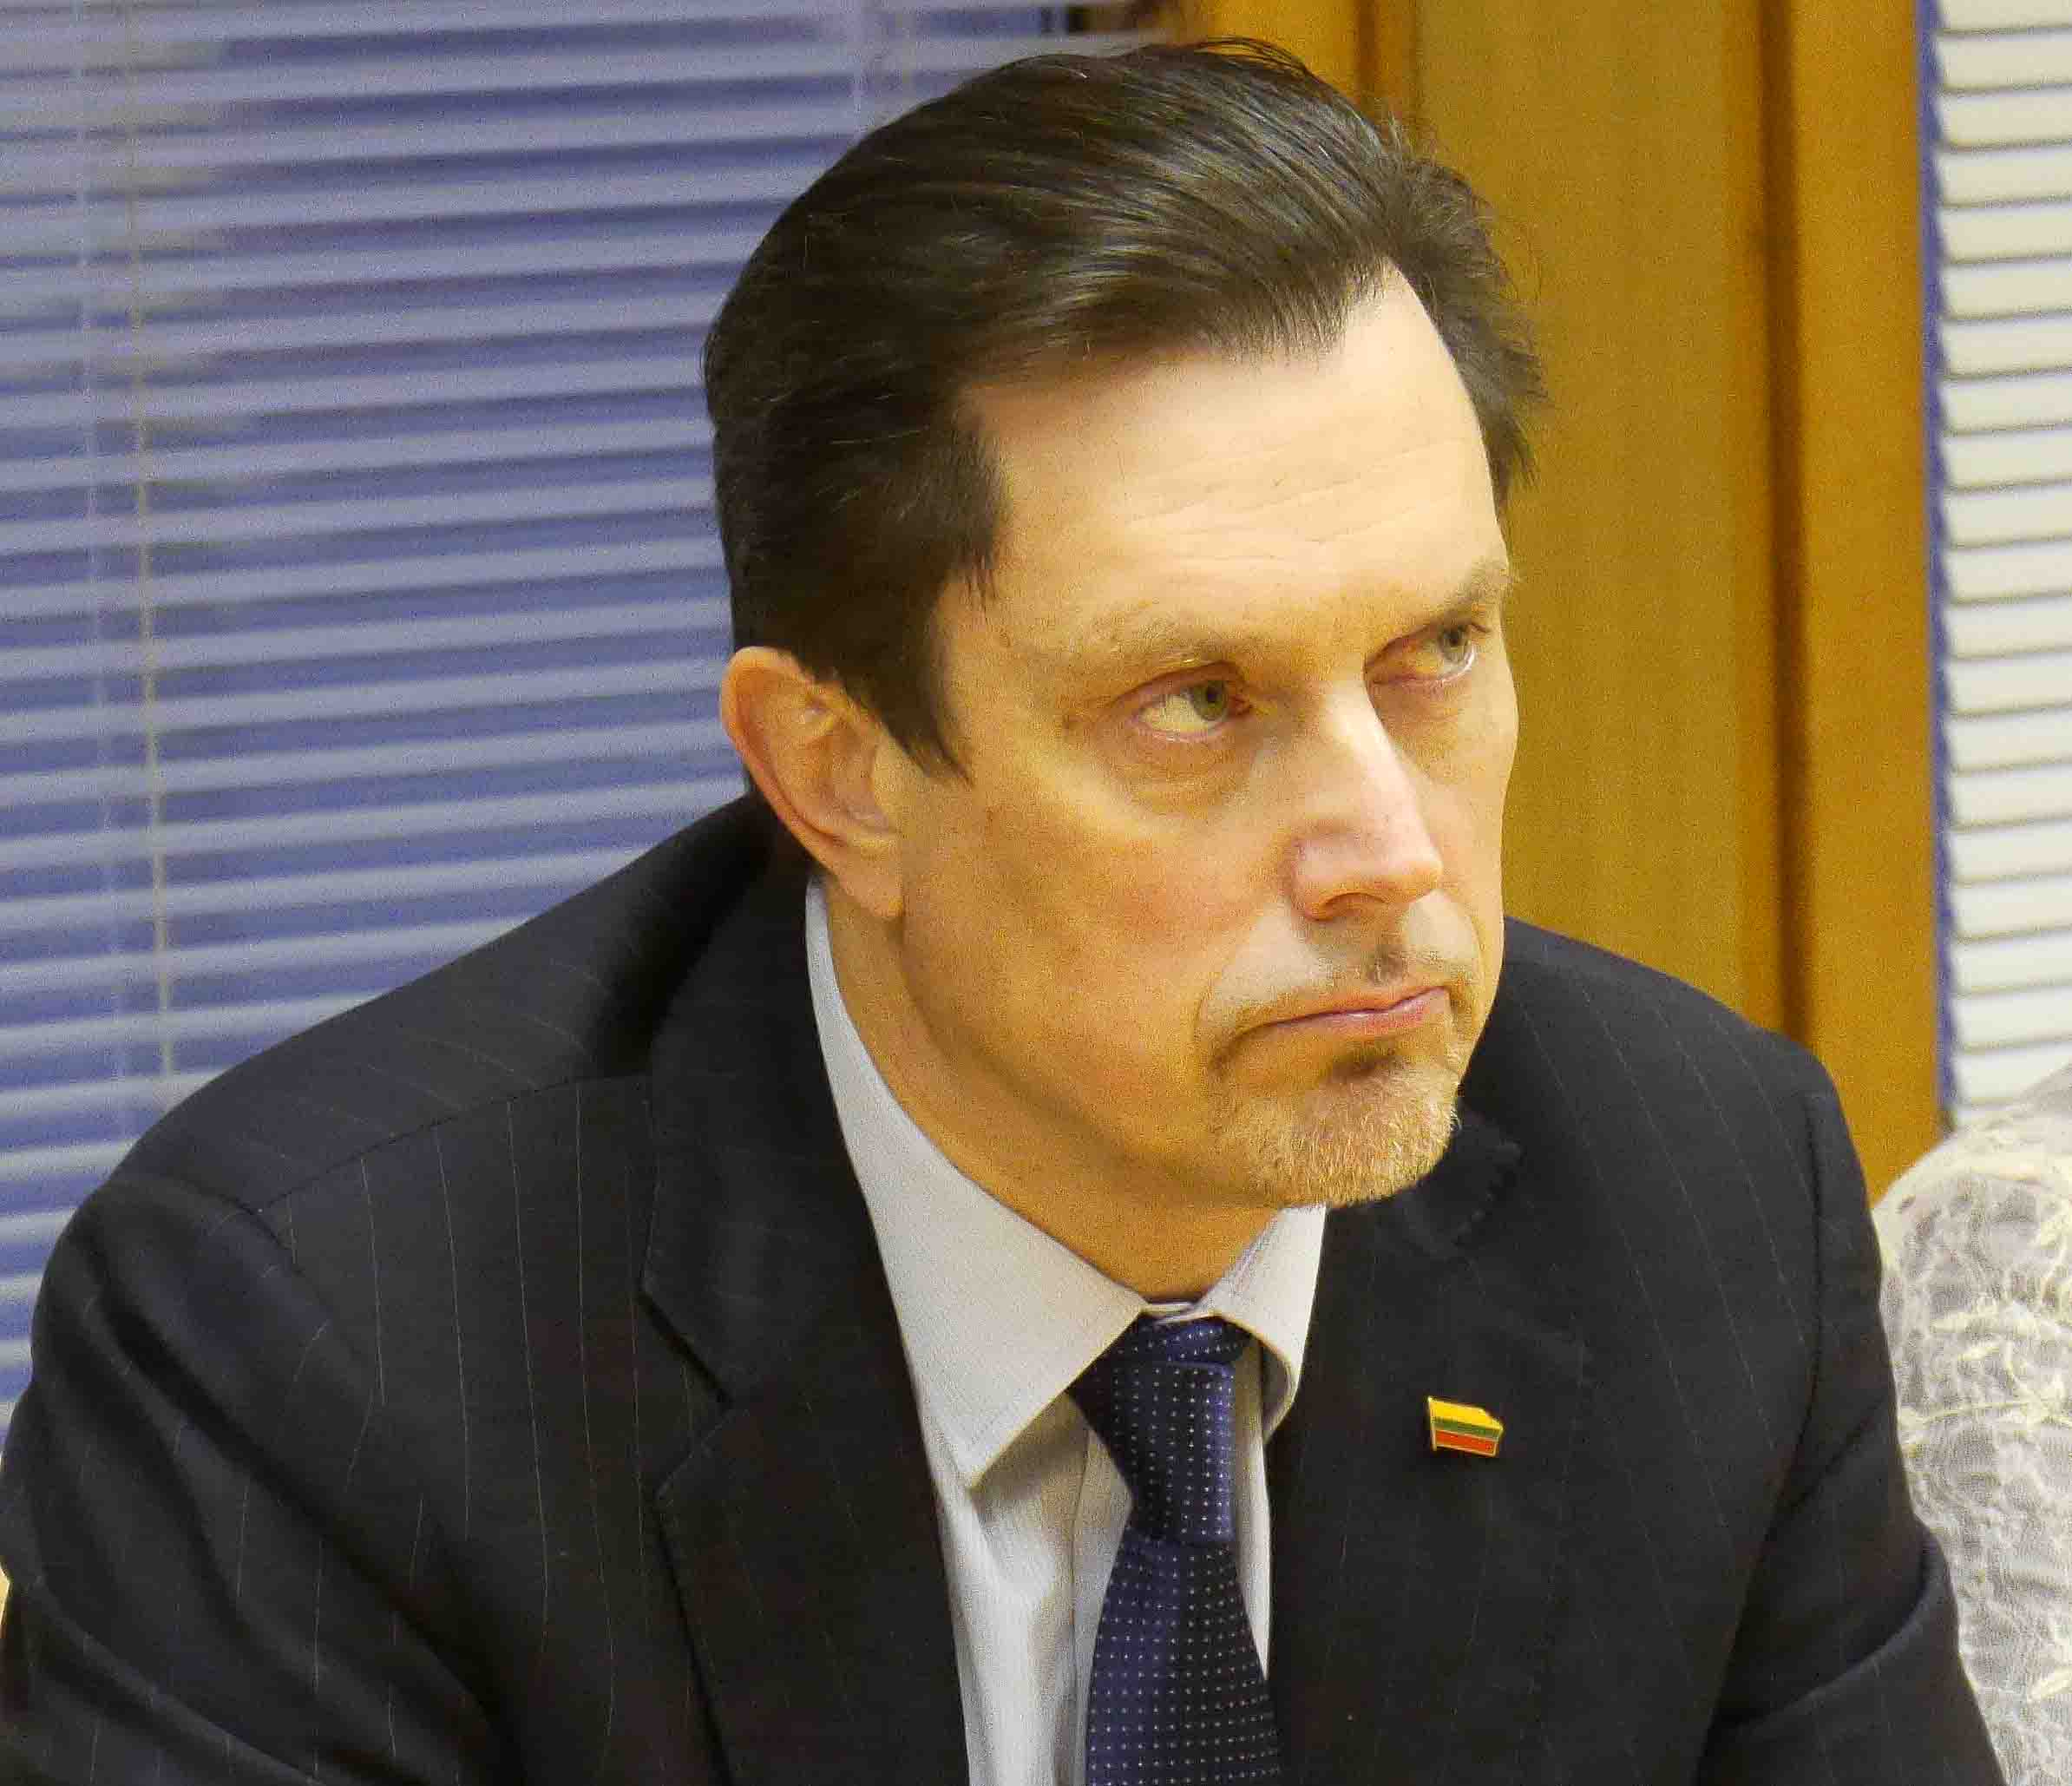 Vytautas Juozapaitis   Alkas.lt, J.Vaiškūno nuotr.